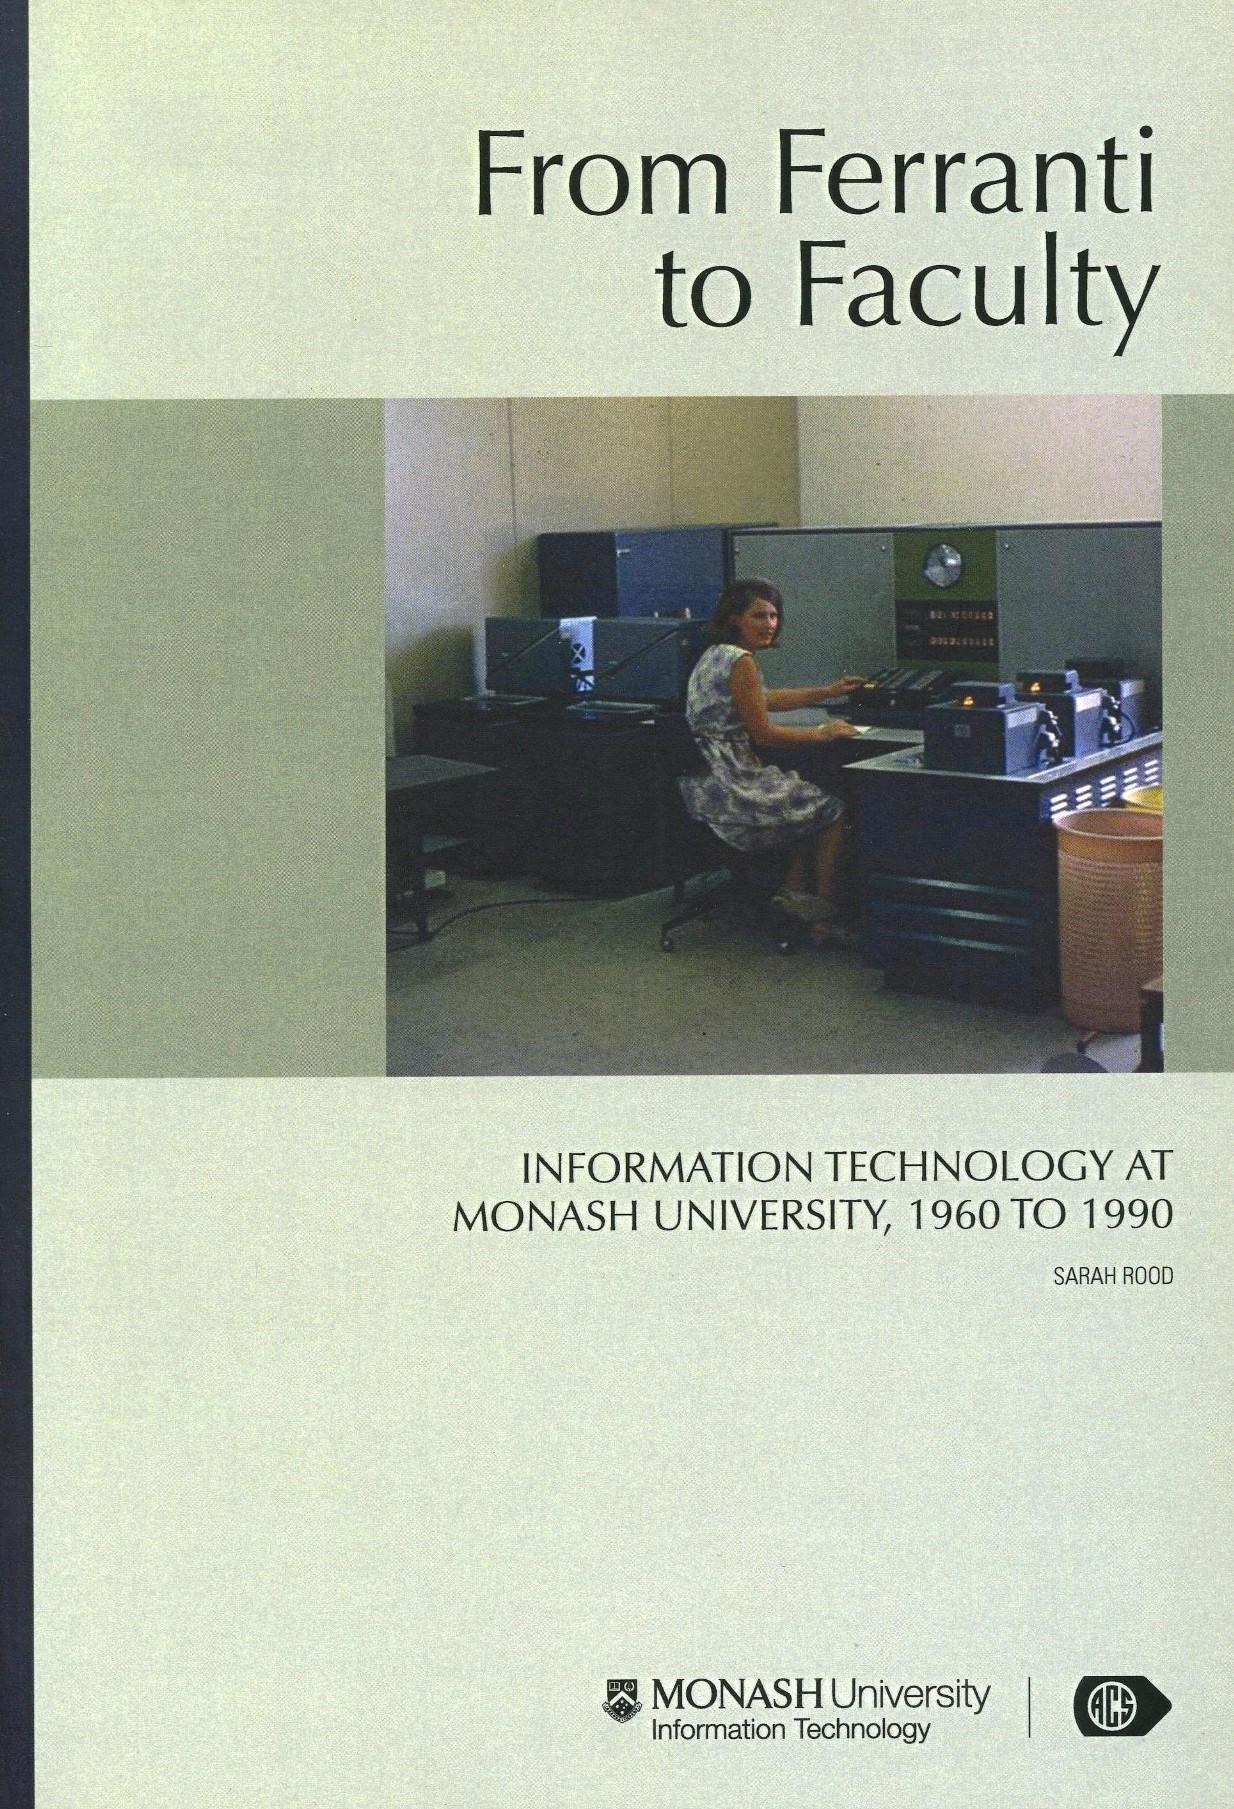 From Ferranti to Faculty.jpg